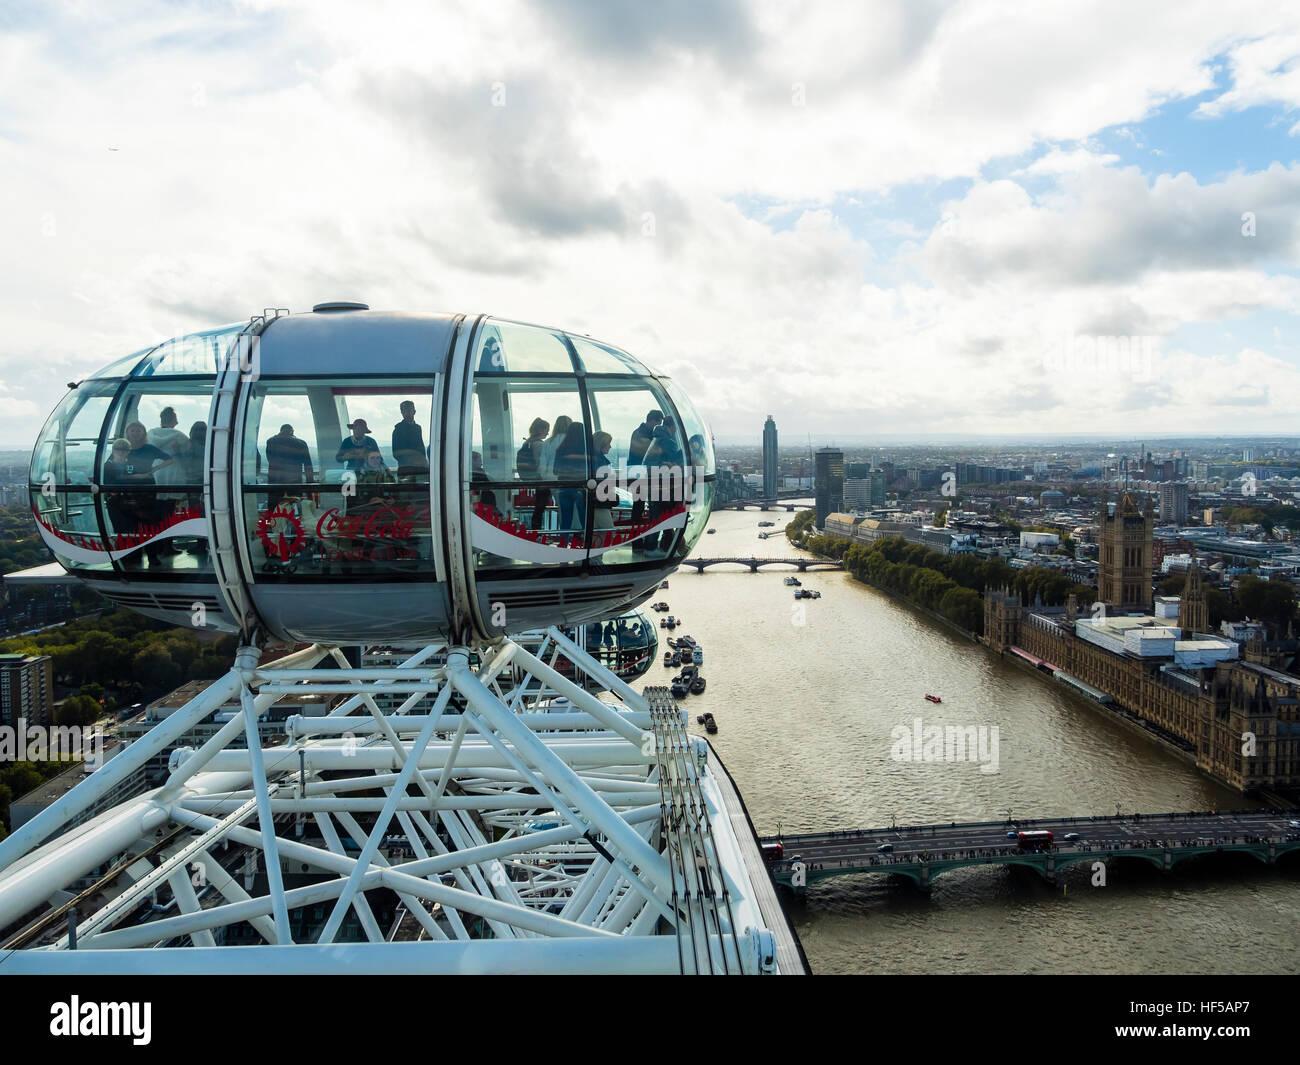 Kapseln, London Eye, London, England, Vereinigtes Königreich Stockbild